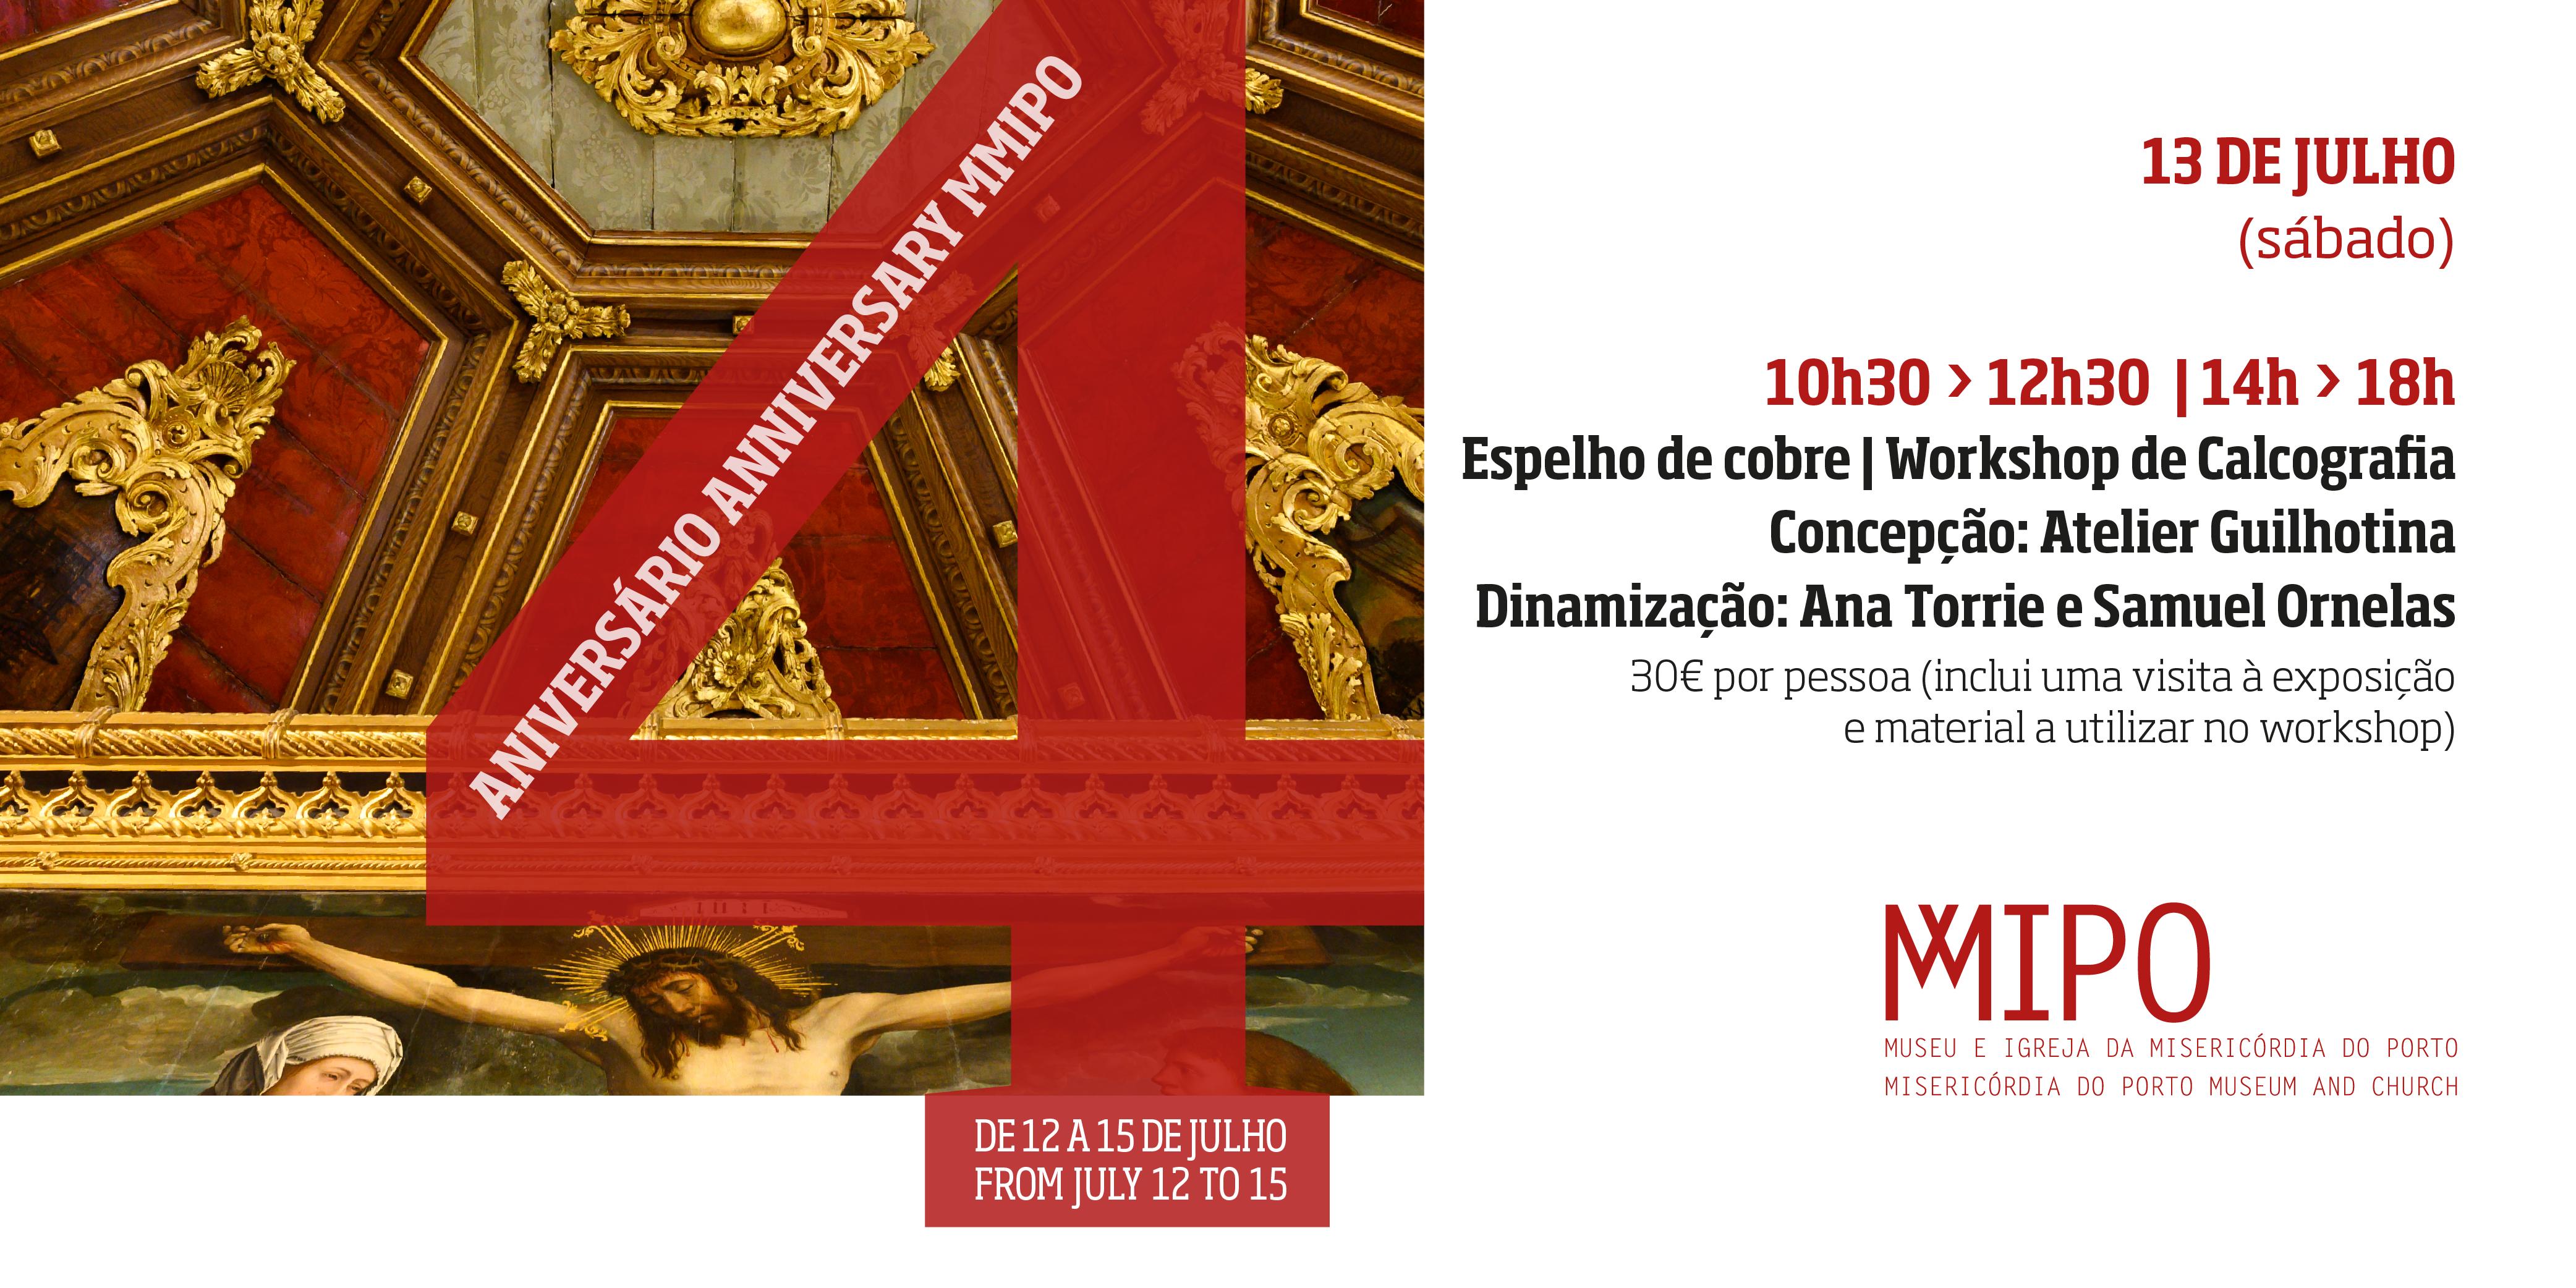 http://www.mmipo.pt/assets/misc/slideshow/2019/M%204%20aniversario%20suportes%20digitais_banner%20site%20copy%204.png